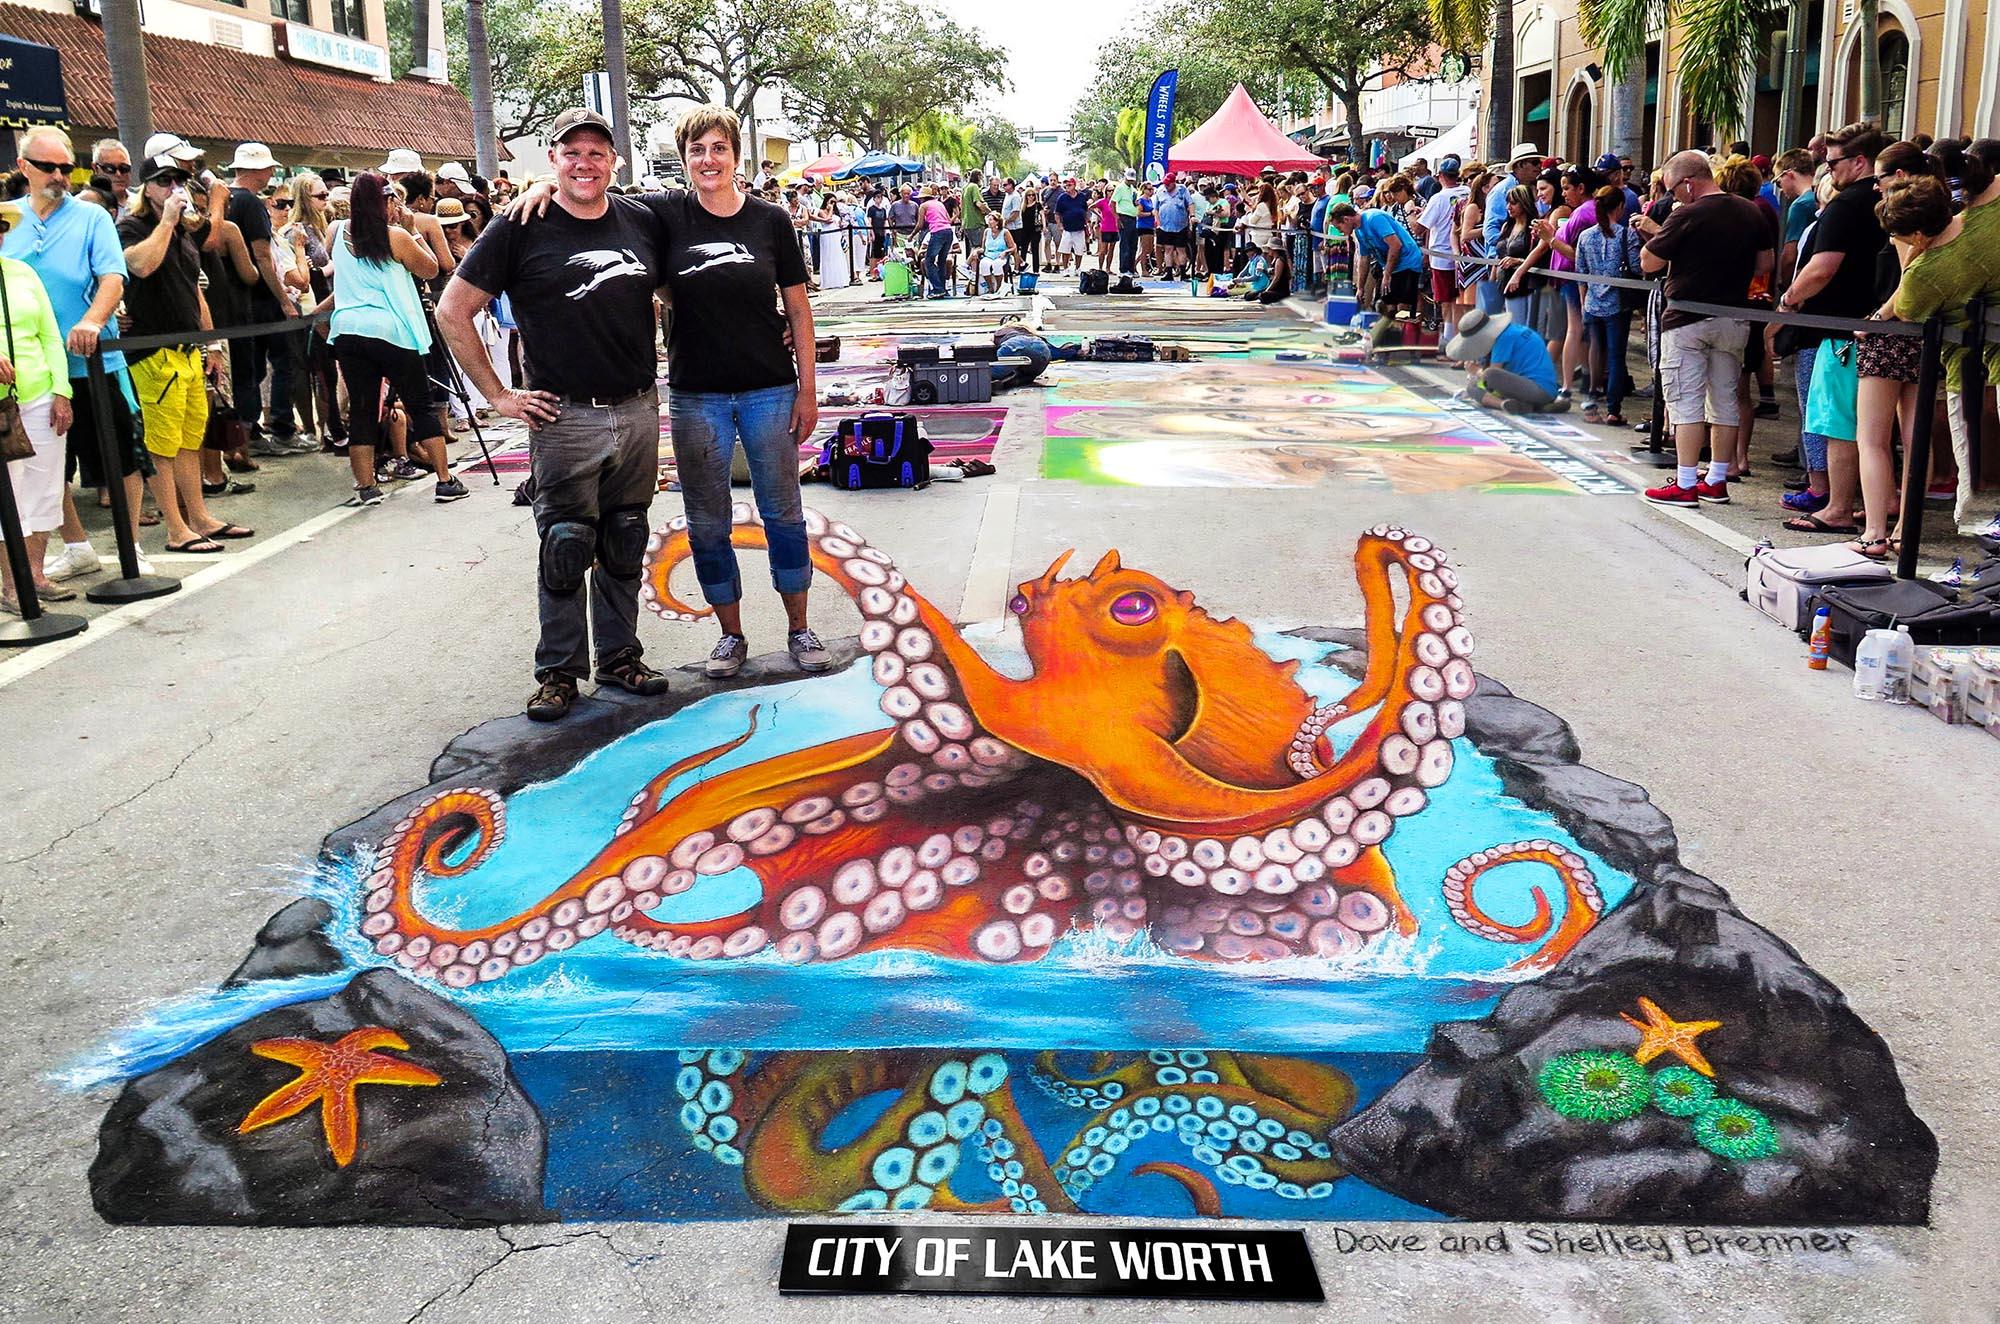 2017 Lake Worth Street Painting Festival, Lake Worth, FL